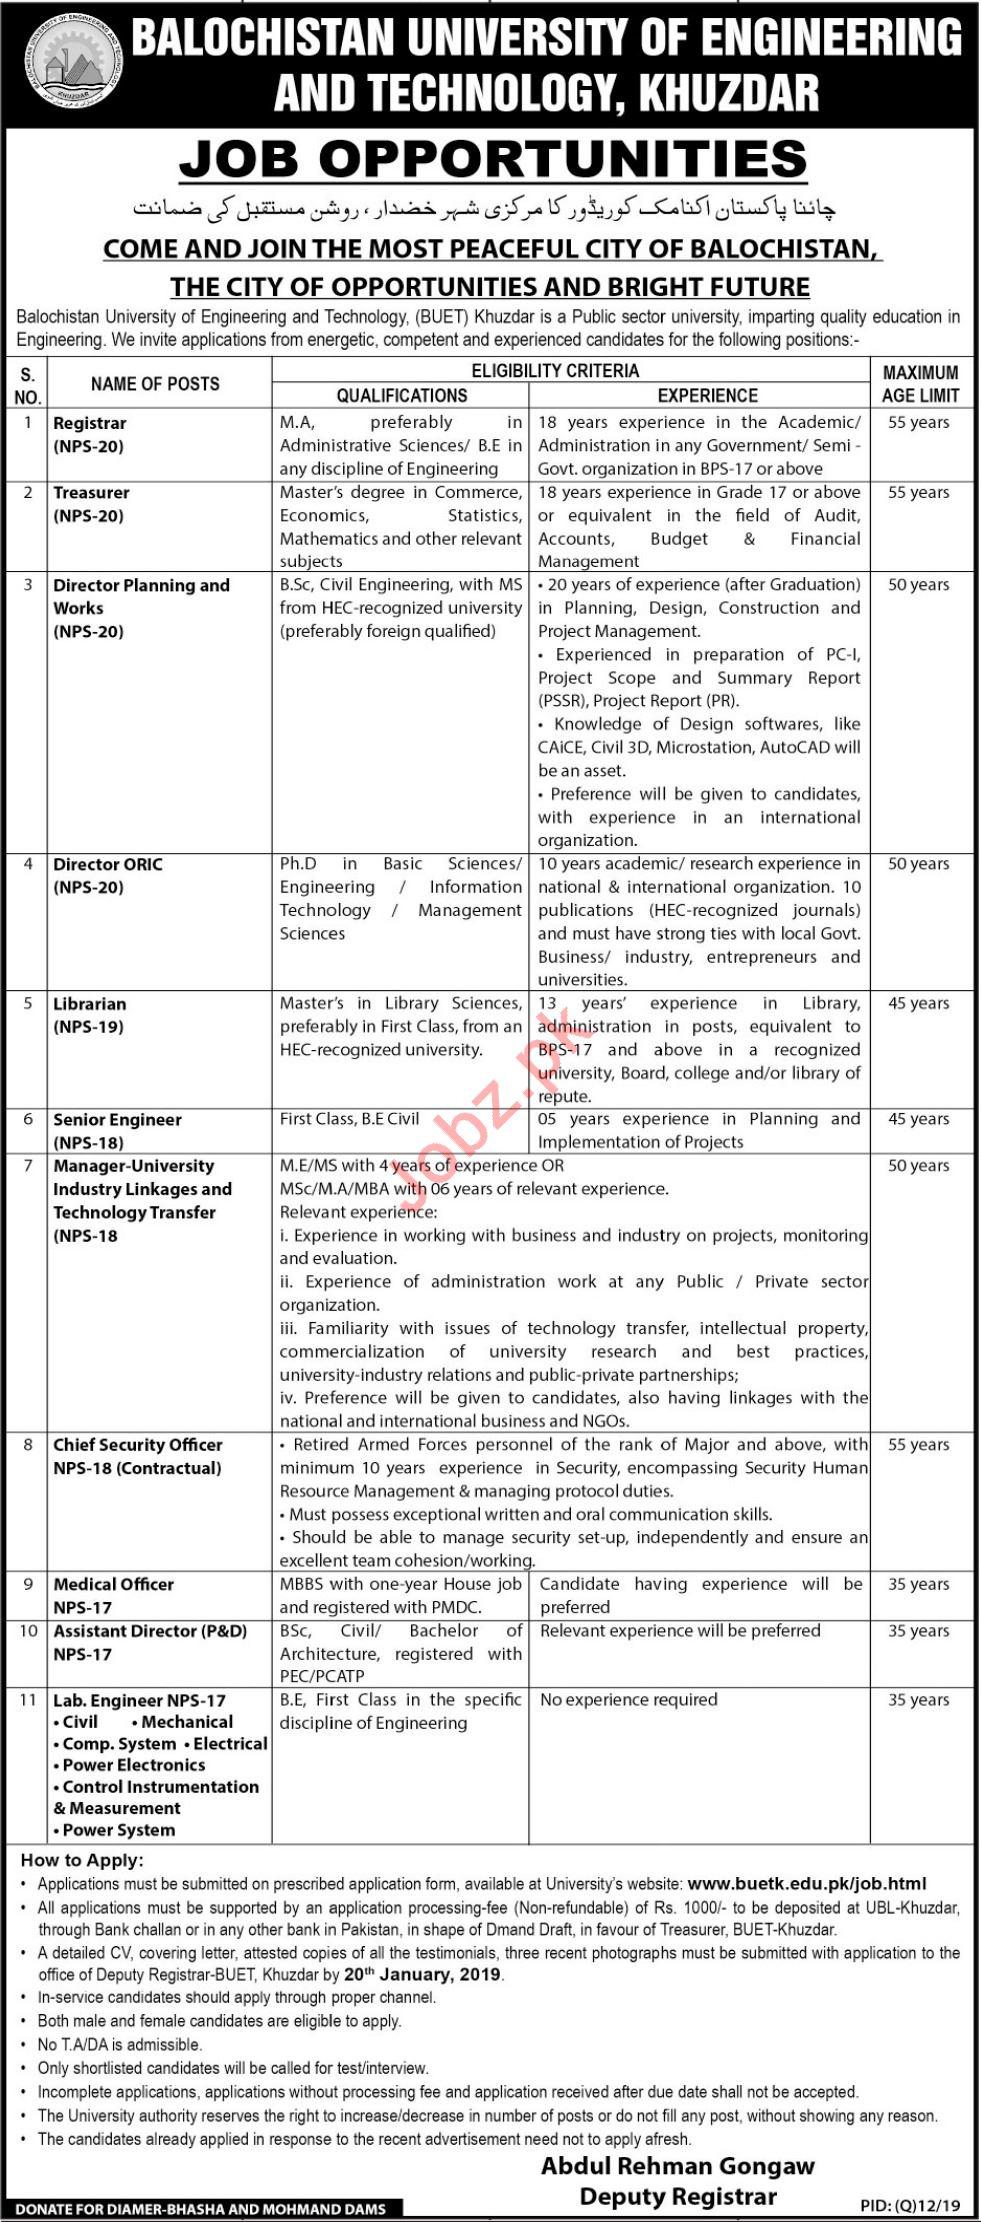 Balochistan University of Engineering & Technology Jobs 2019